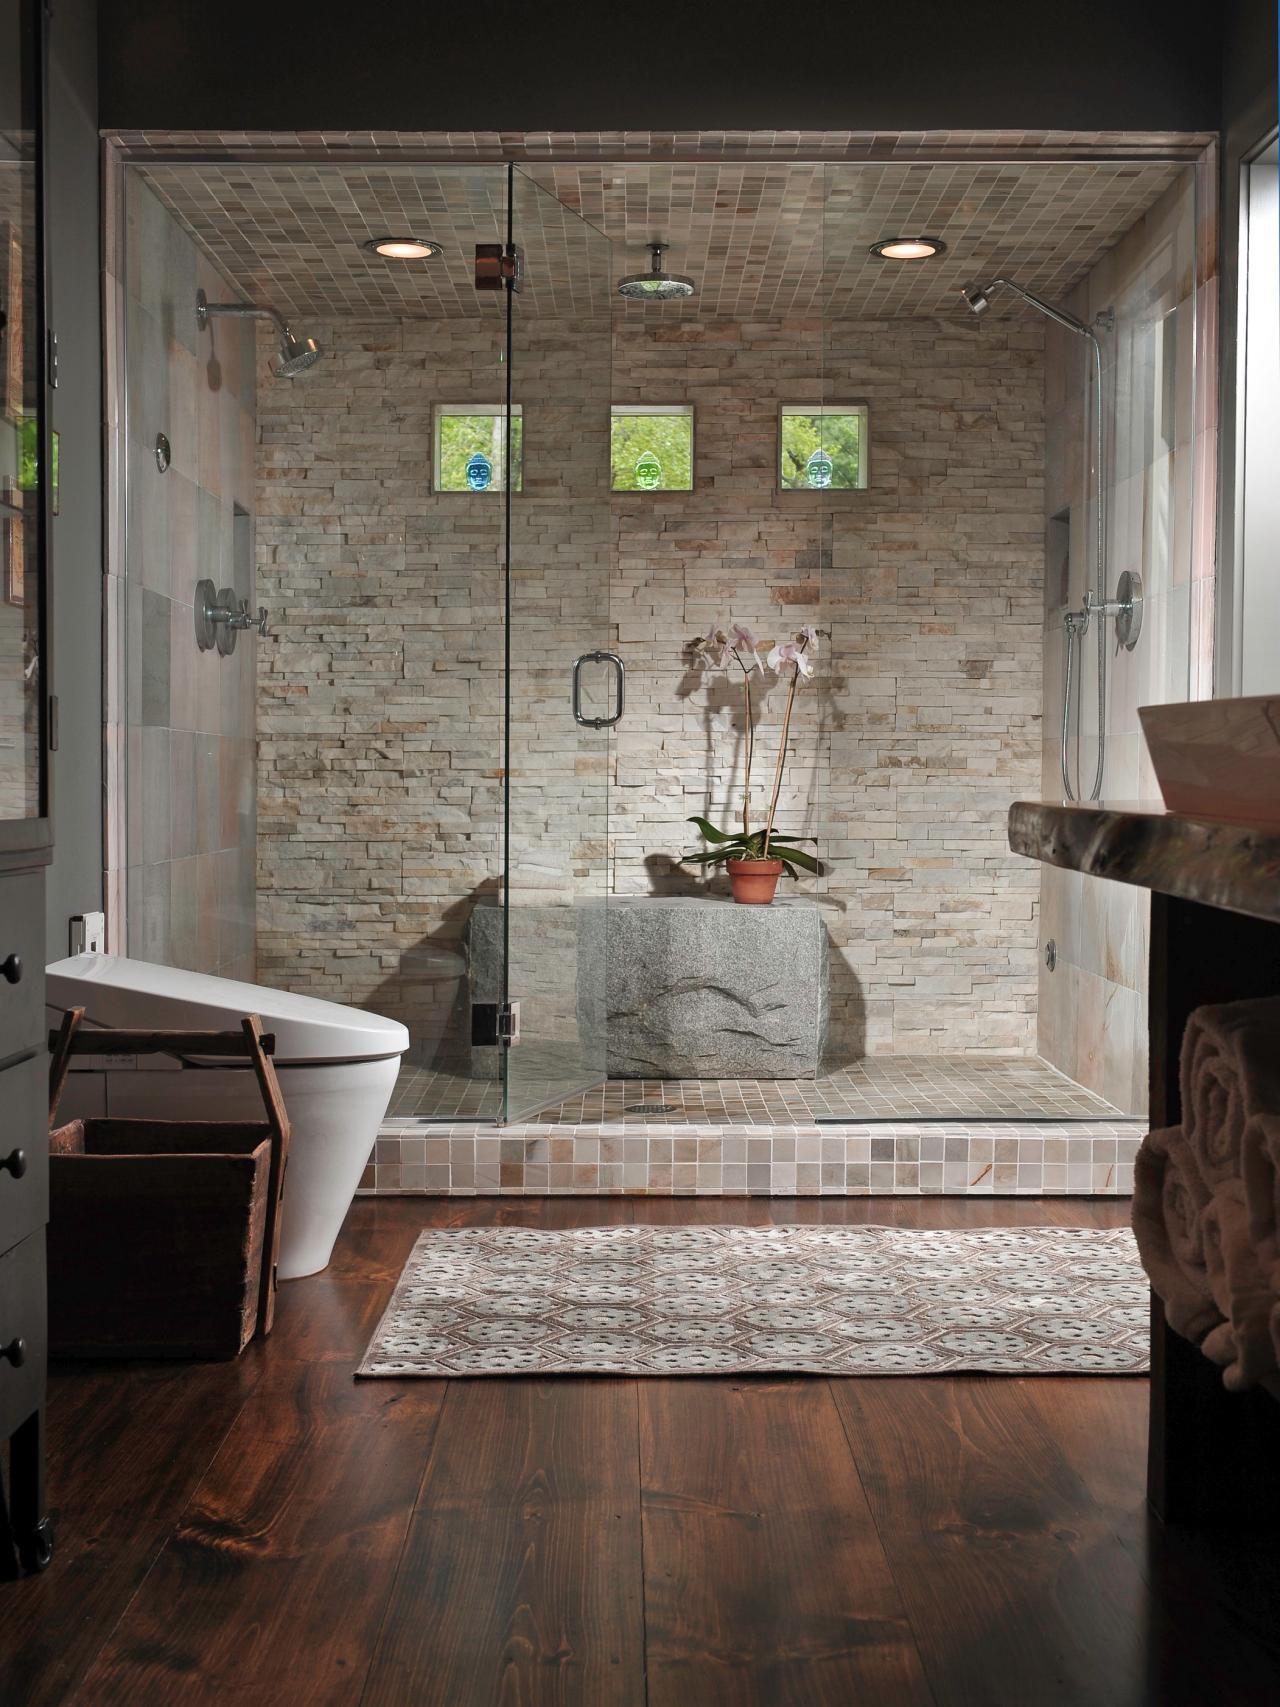 Speakers for bathroom ceiling - Luxurious Showers Bathroom Ideas Amp Designs Hgtv